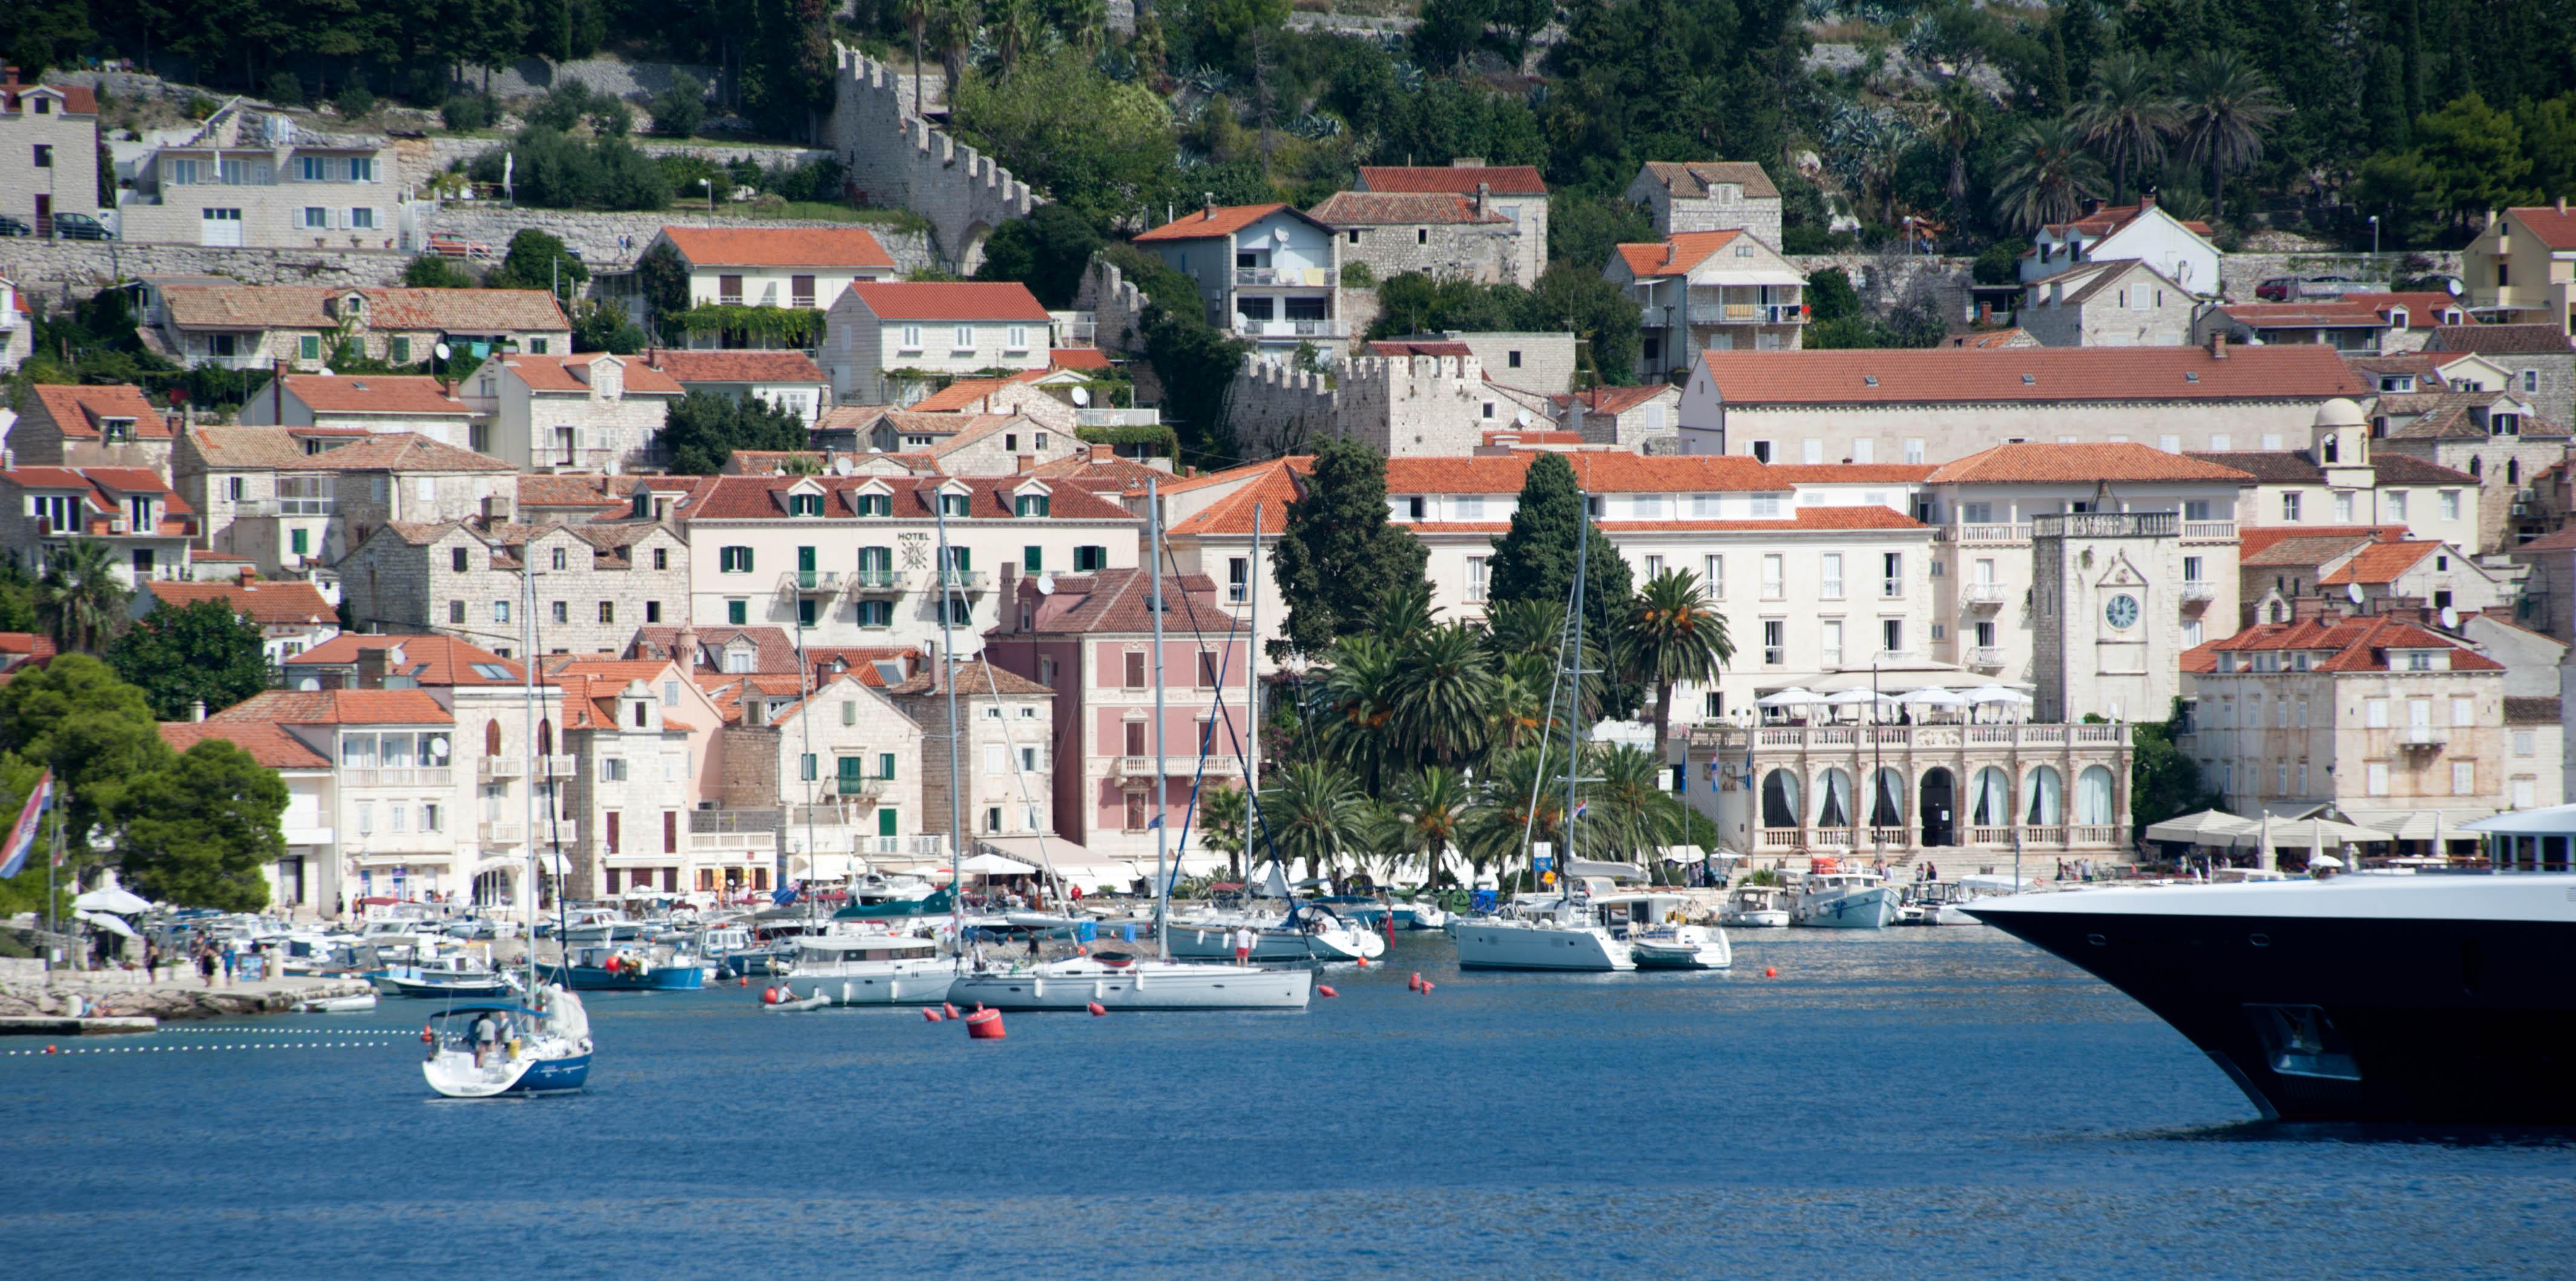 9852-Hvar (Dalmatie centrale)